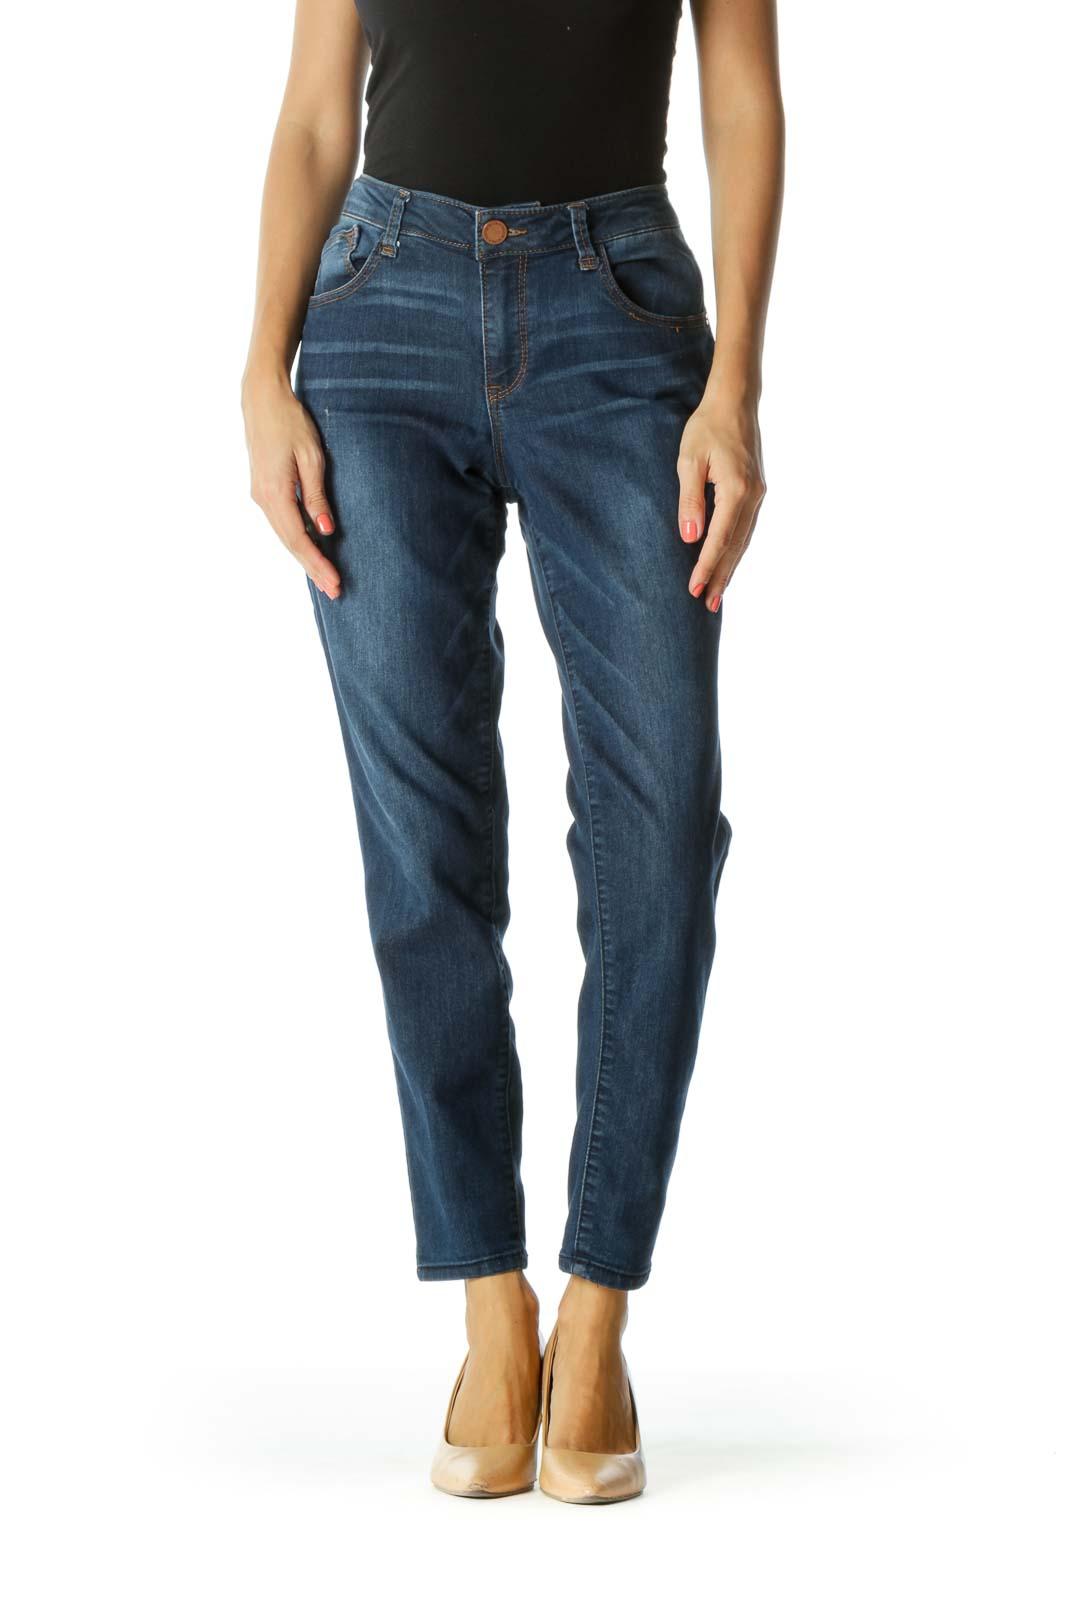 Blue Medium-Wash Distressed-Details Stretch Jeans Front